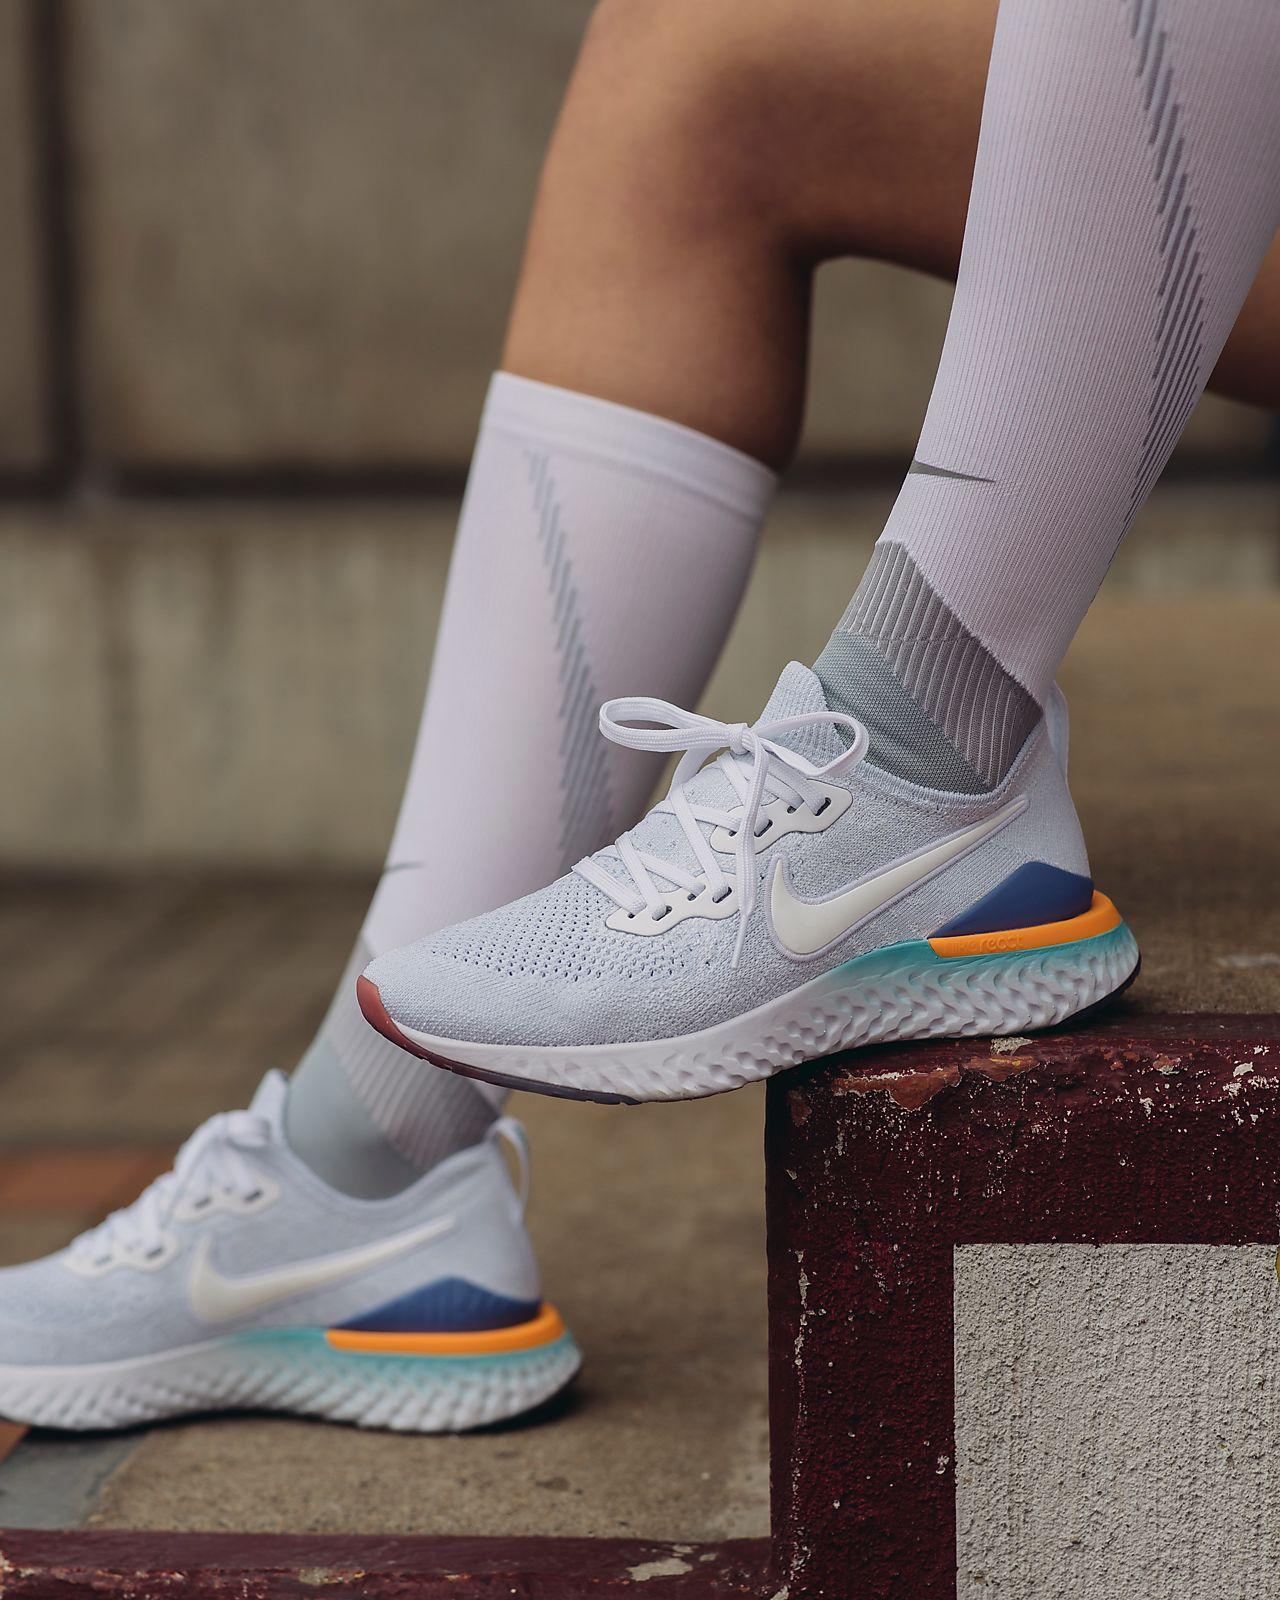 Nike Epic React Flyknit 2 Zapatillas de running - Mujer